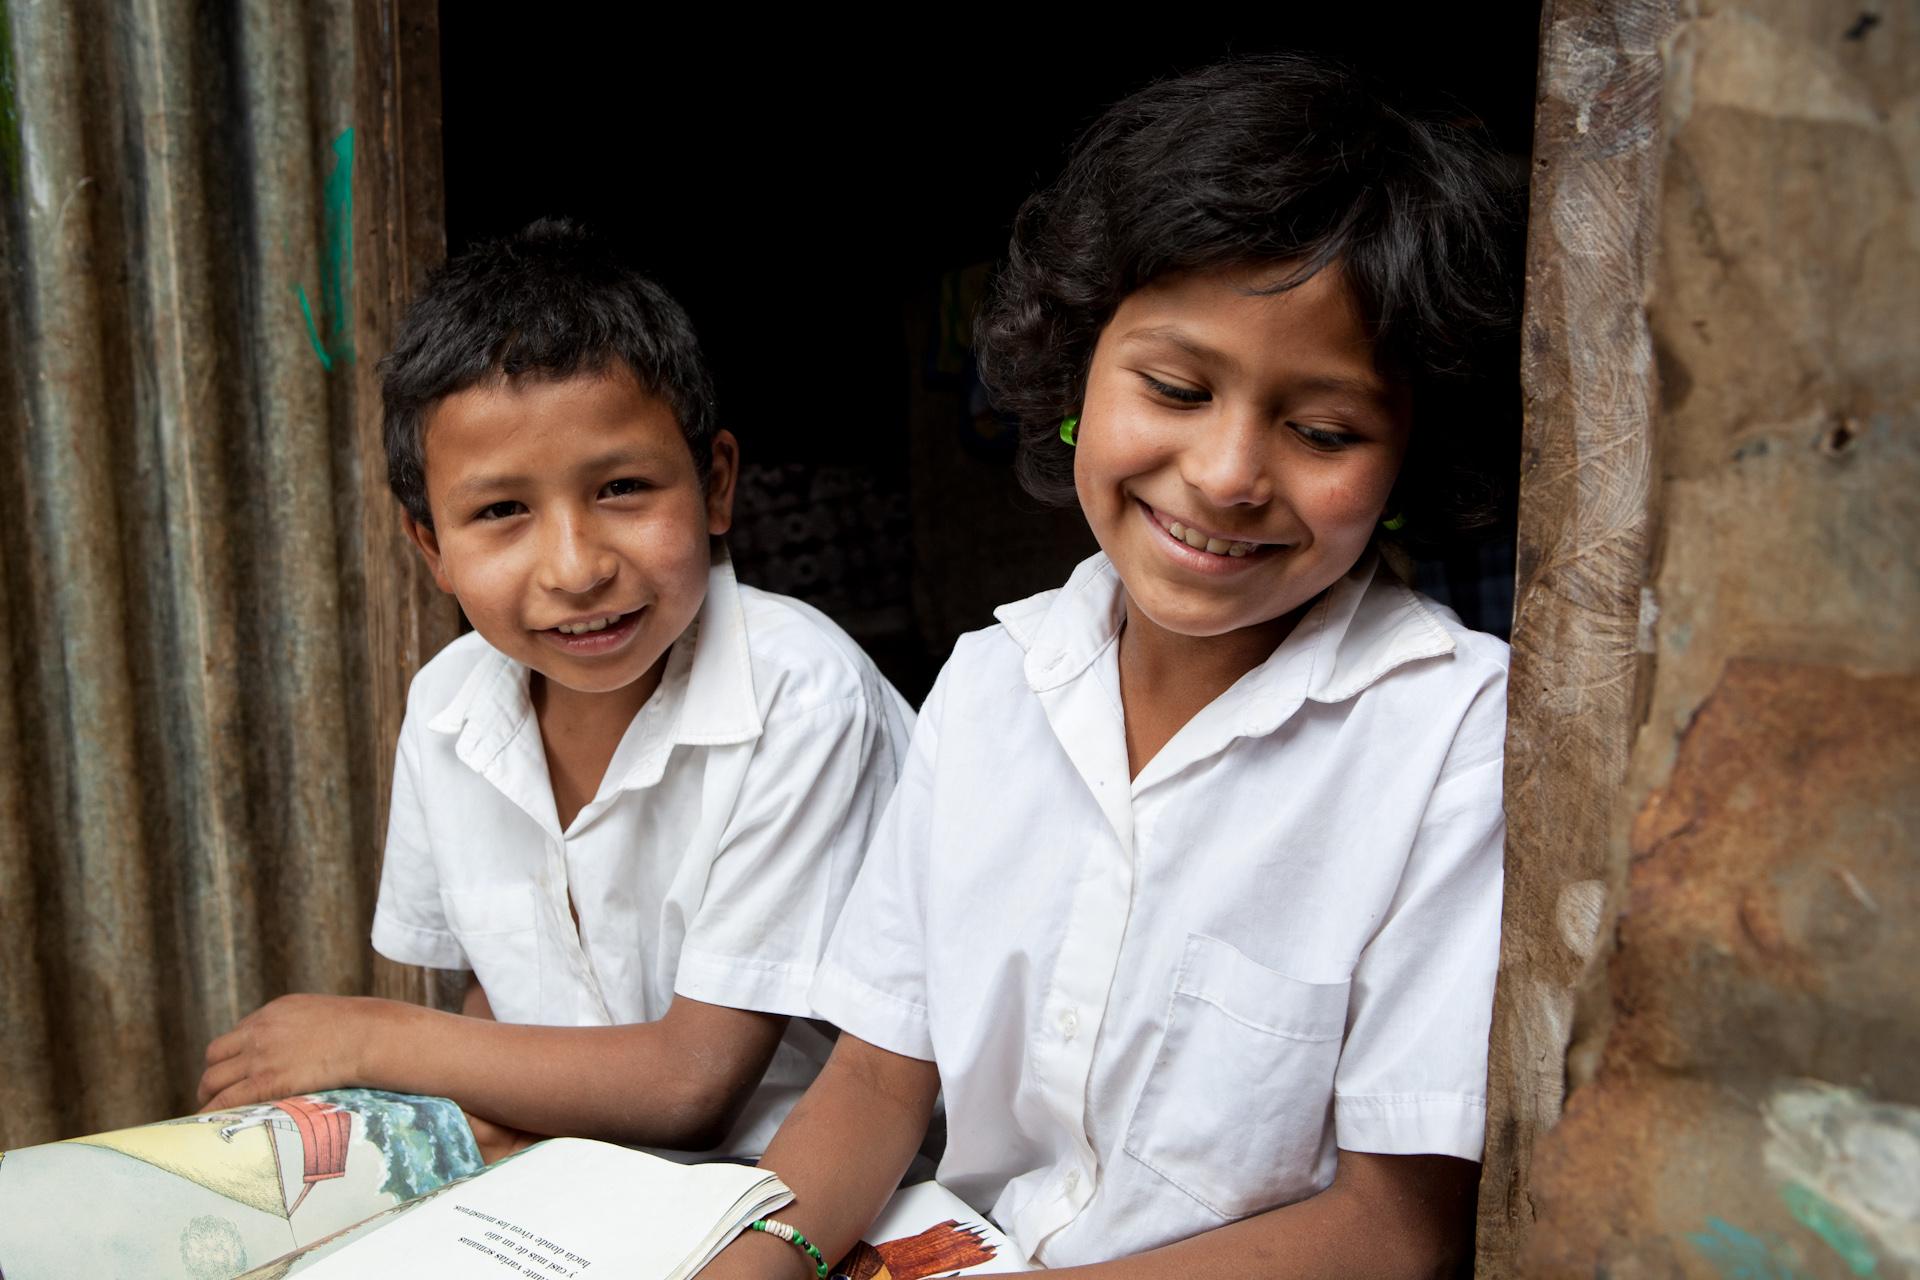 Humanitarian-Education-Contextos-El-Salvador-Jason-Bax-14.JPG